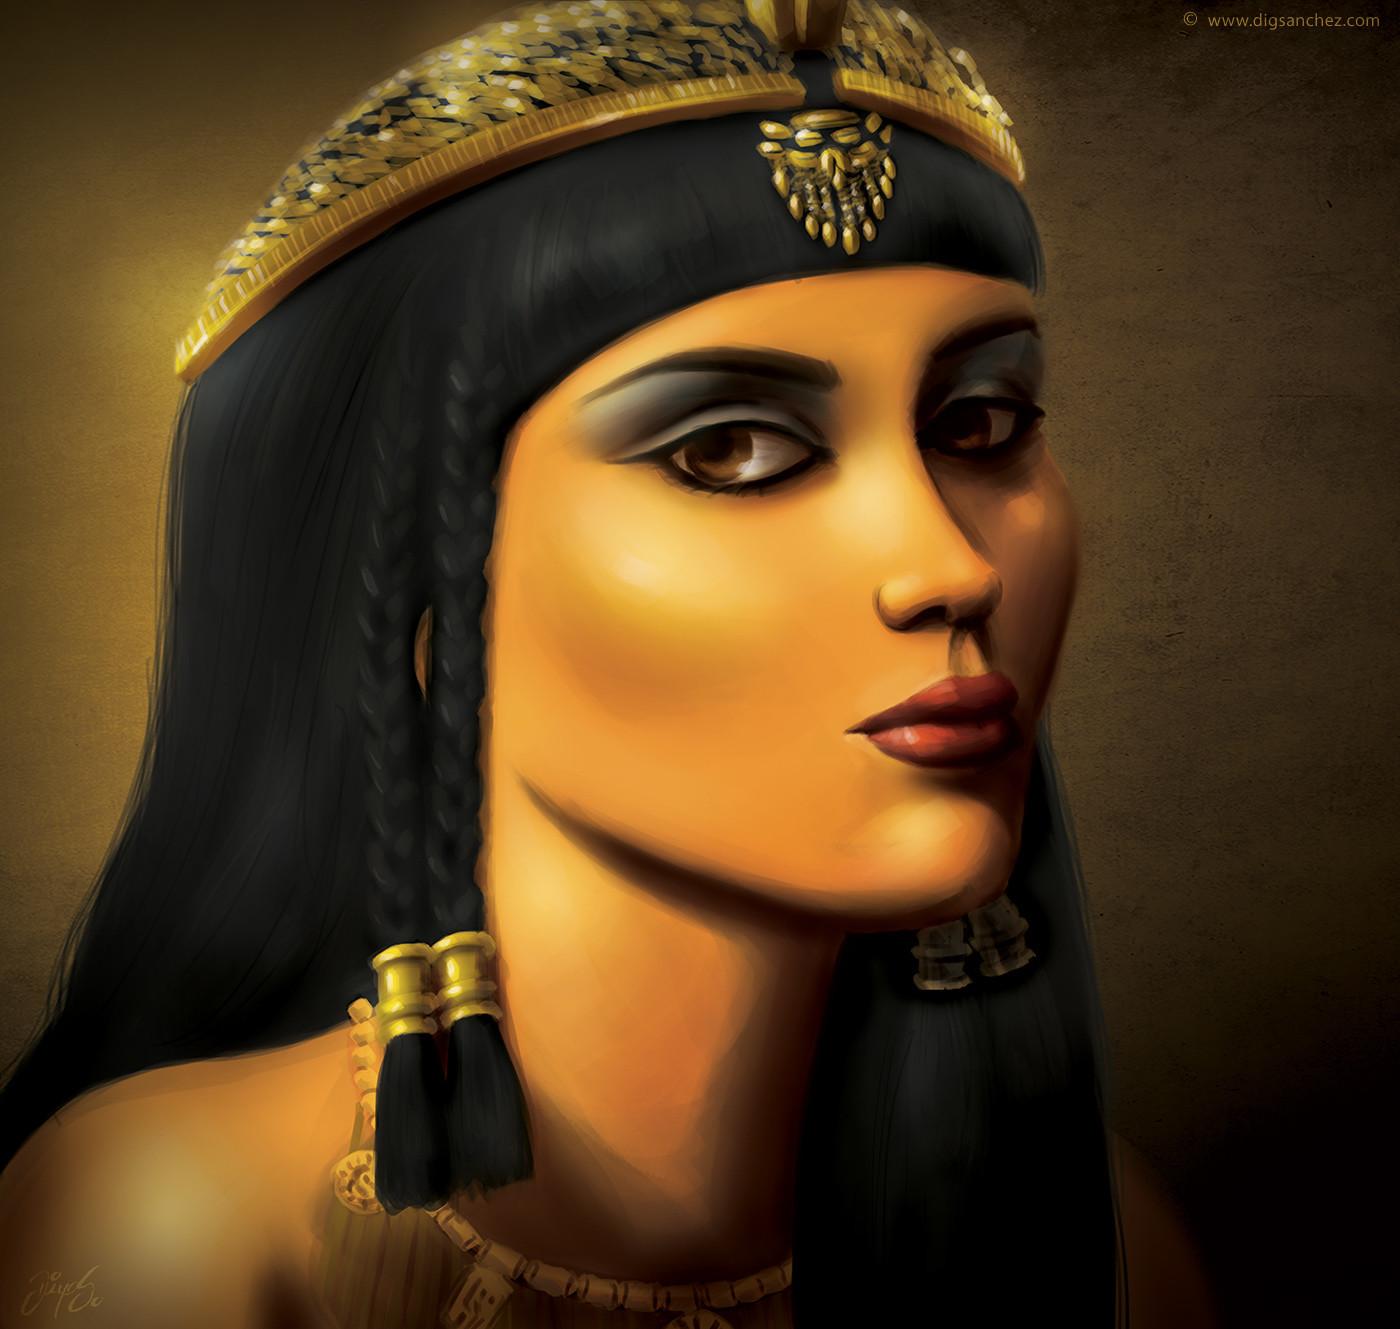 Card character - Cleopatra